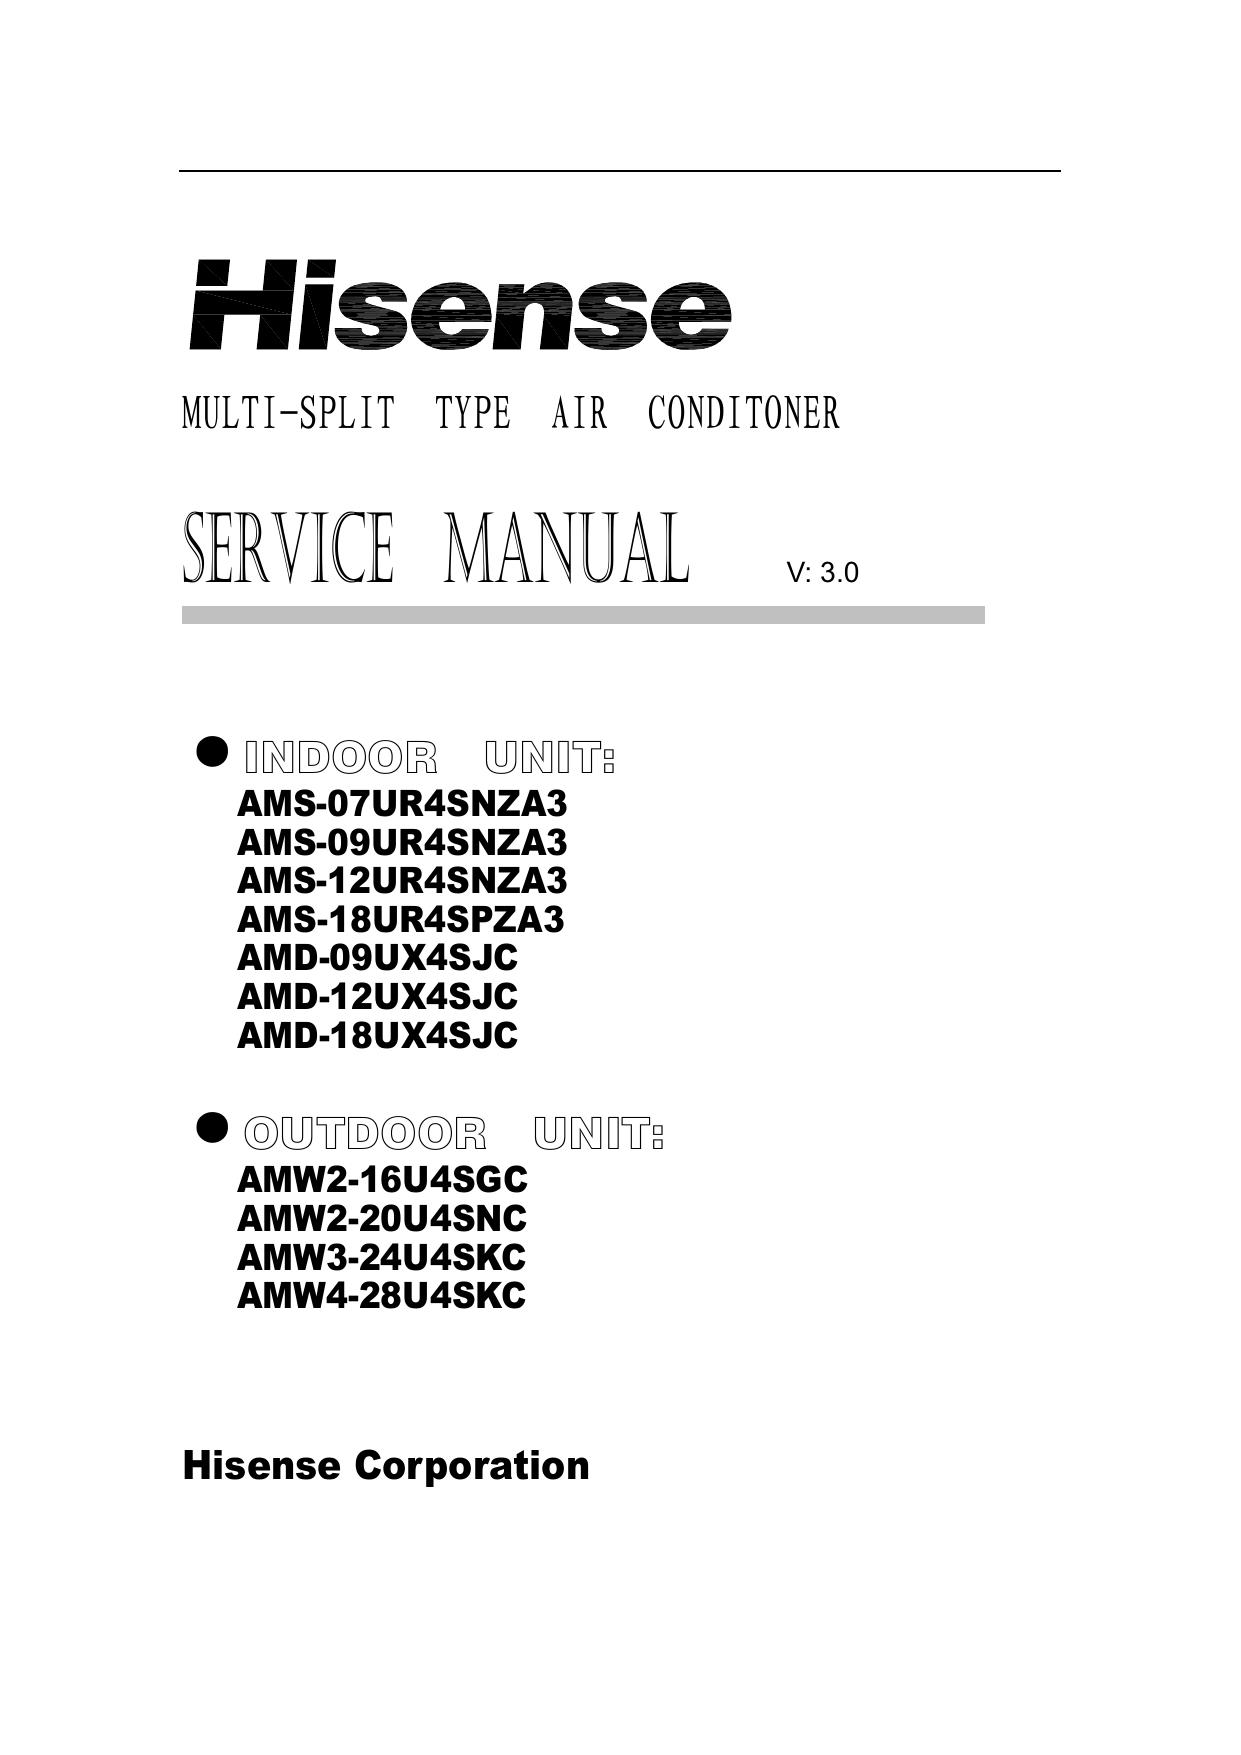 SERVICE MANUAL V: 3.0   5-electrical data.pdf